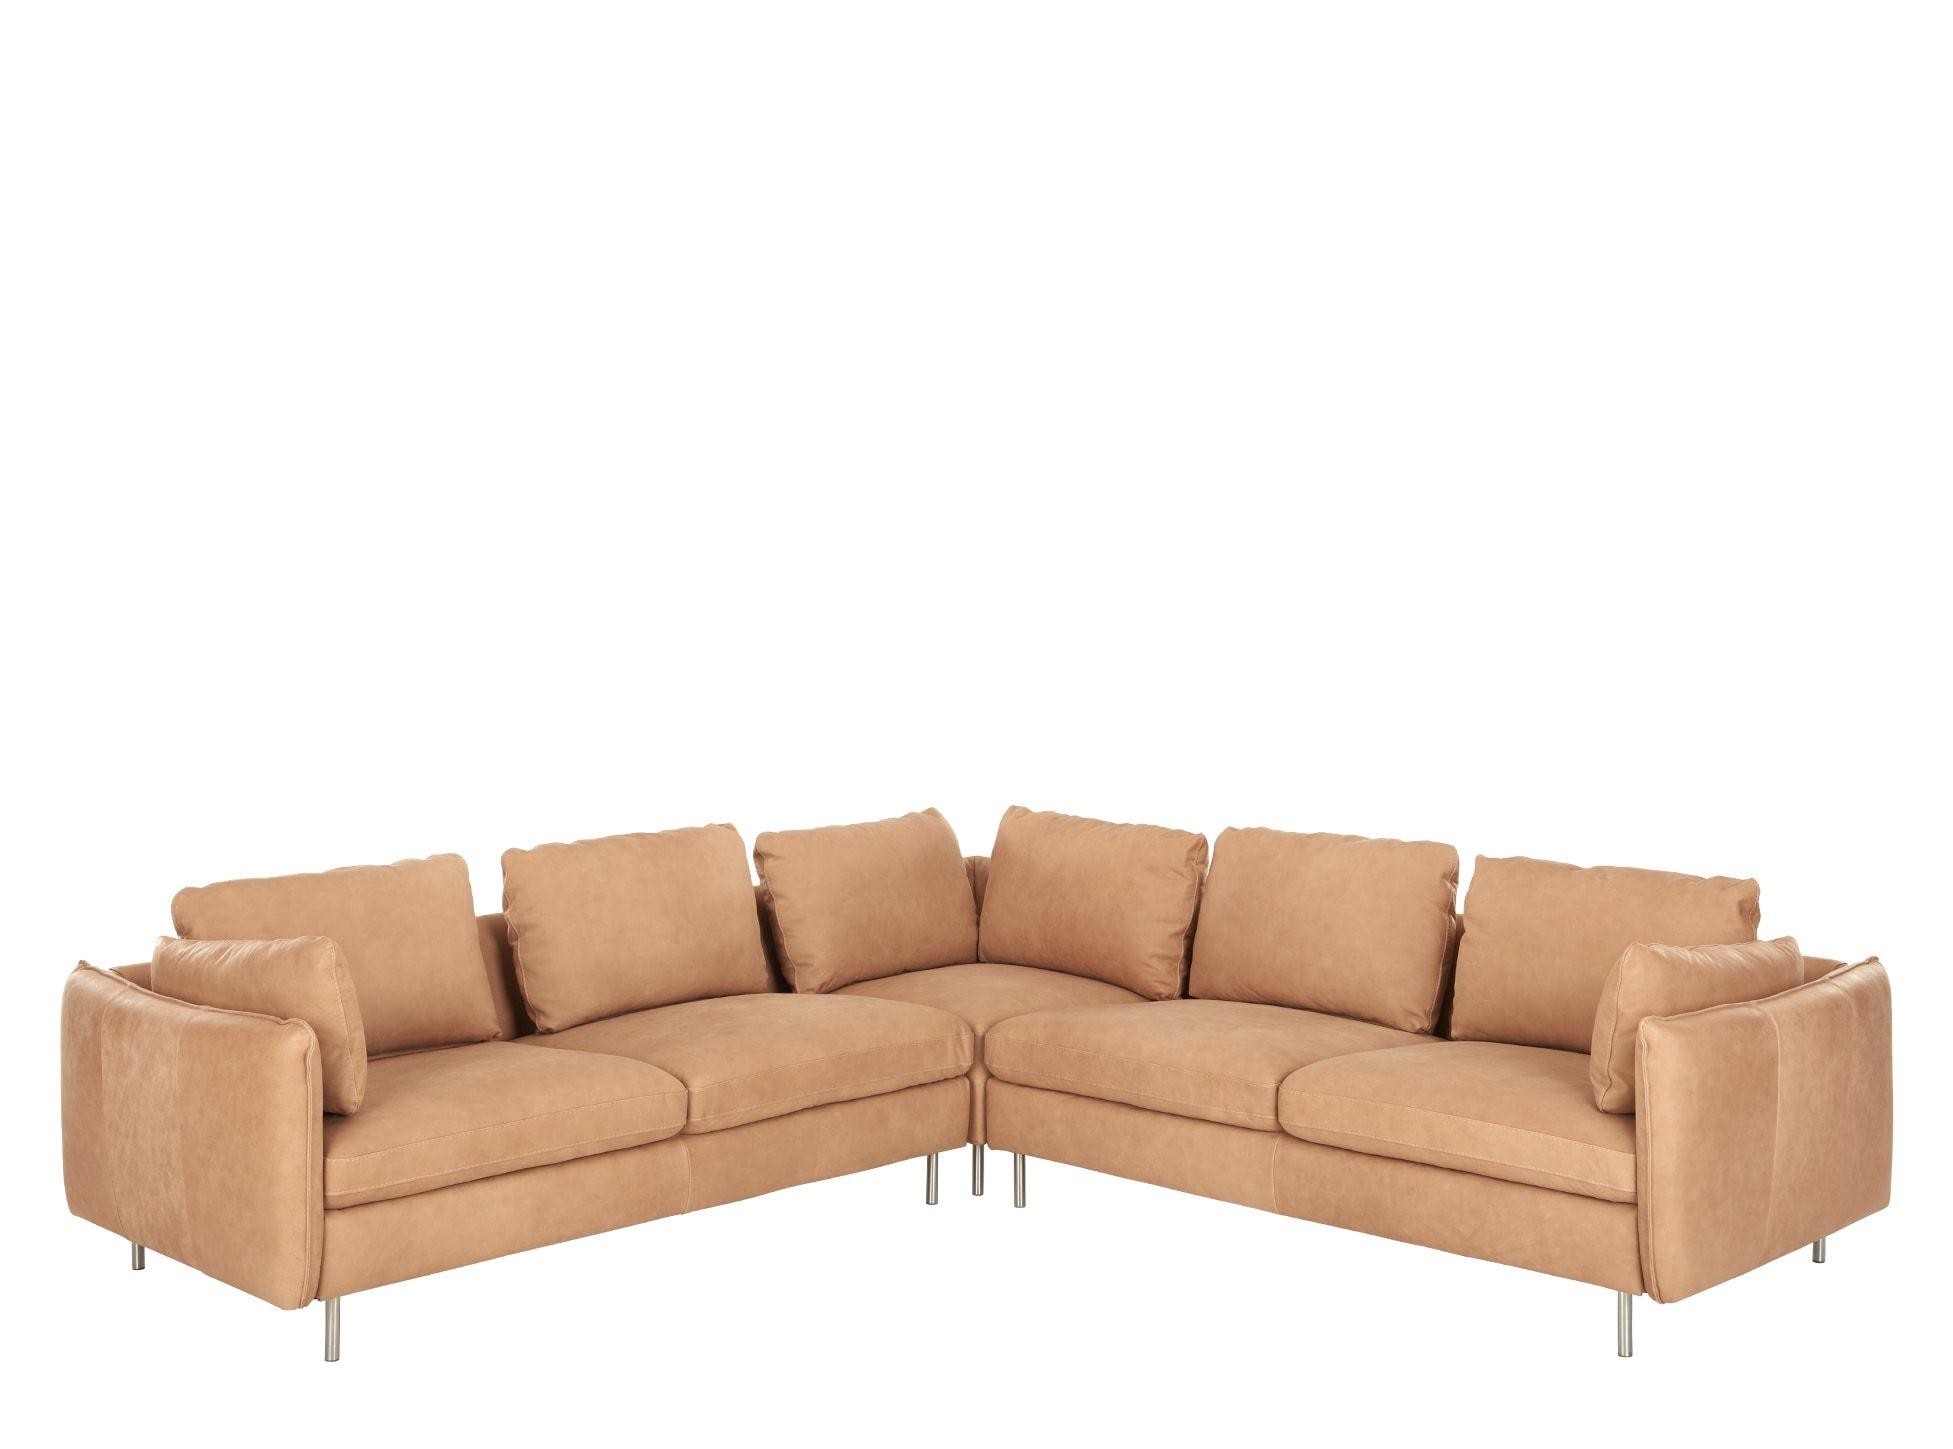 Vento Canape D Angle 5 Places Cuir Brun 5 Seater Corner Sofa Corner Sofa Sofa